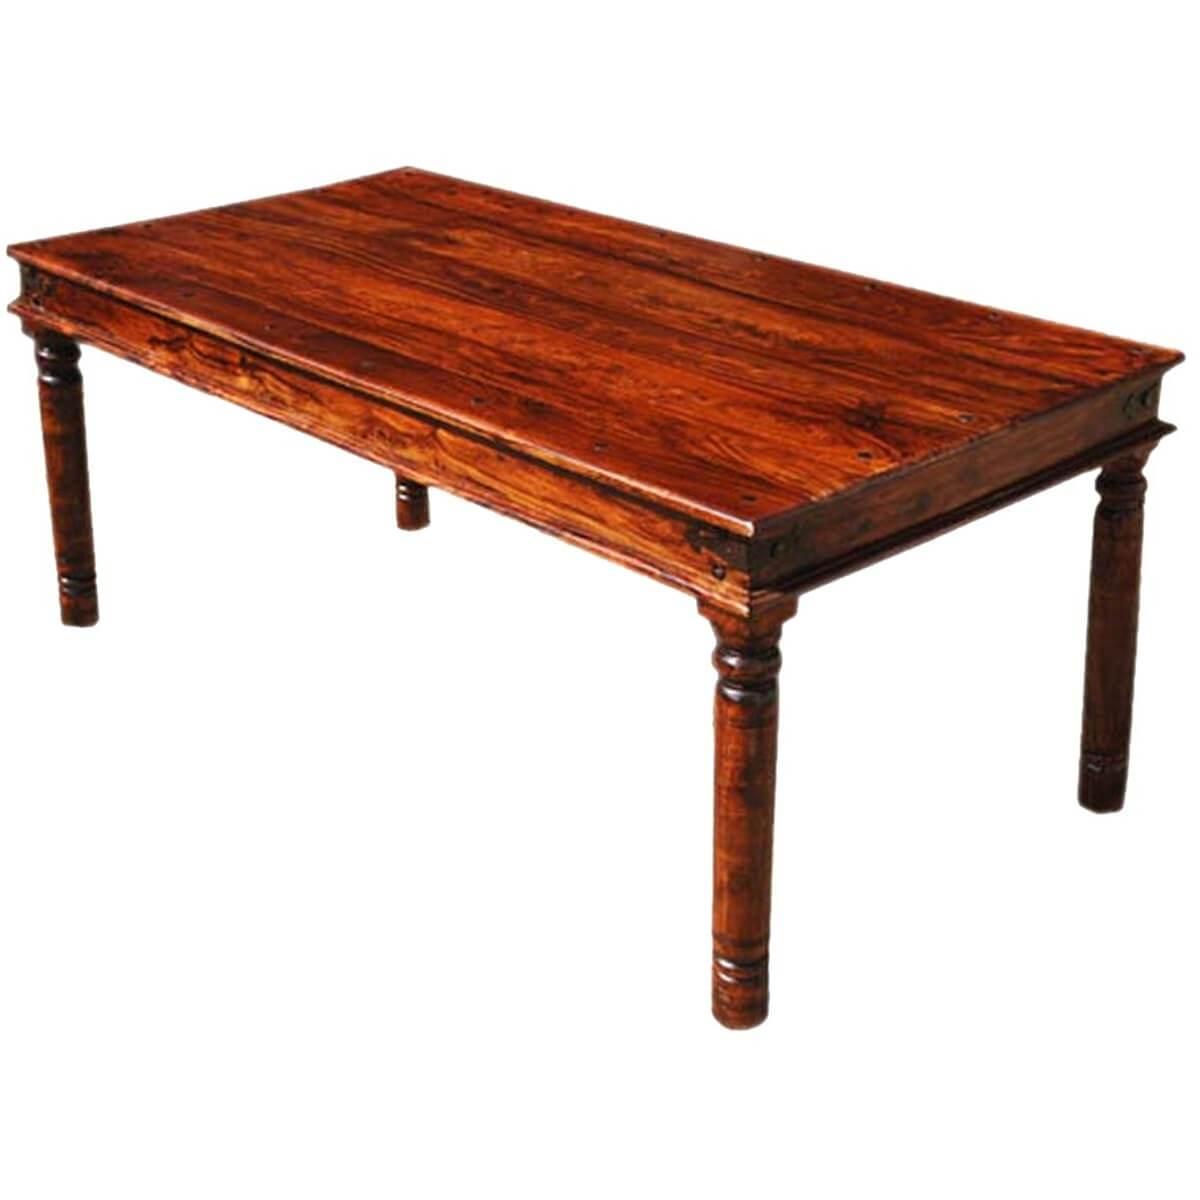 grogan rustic solid wood rectangular dining table on solid wood dining table id=41556